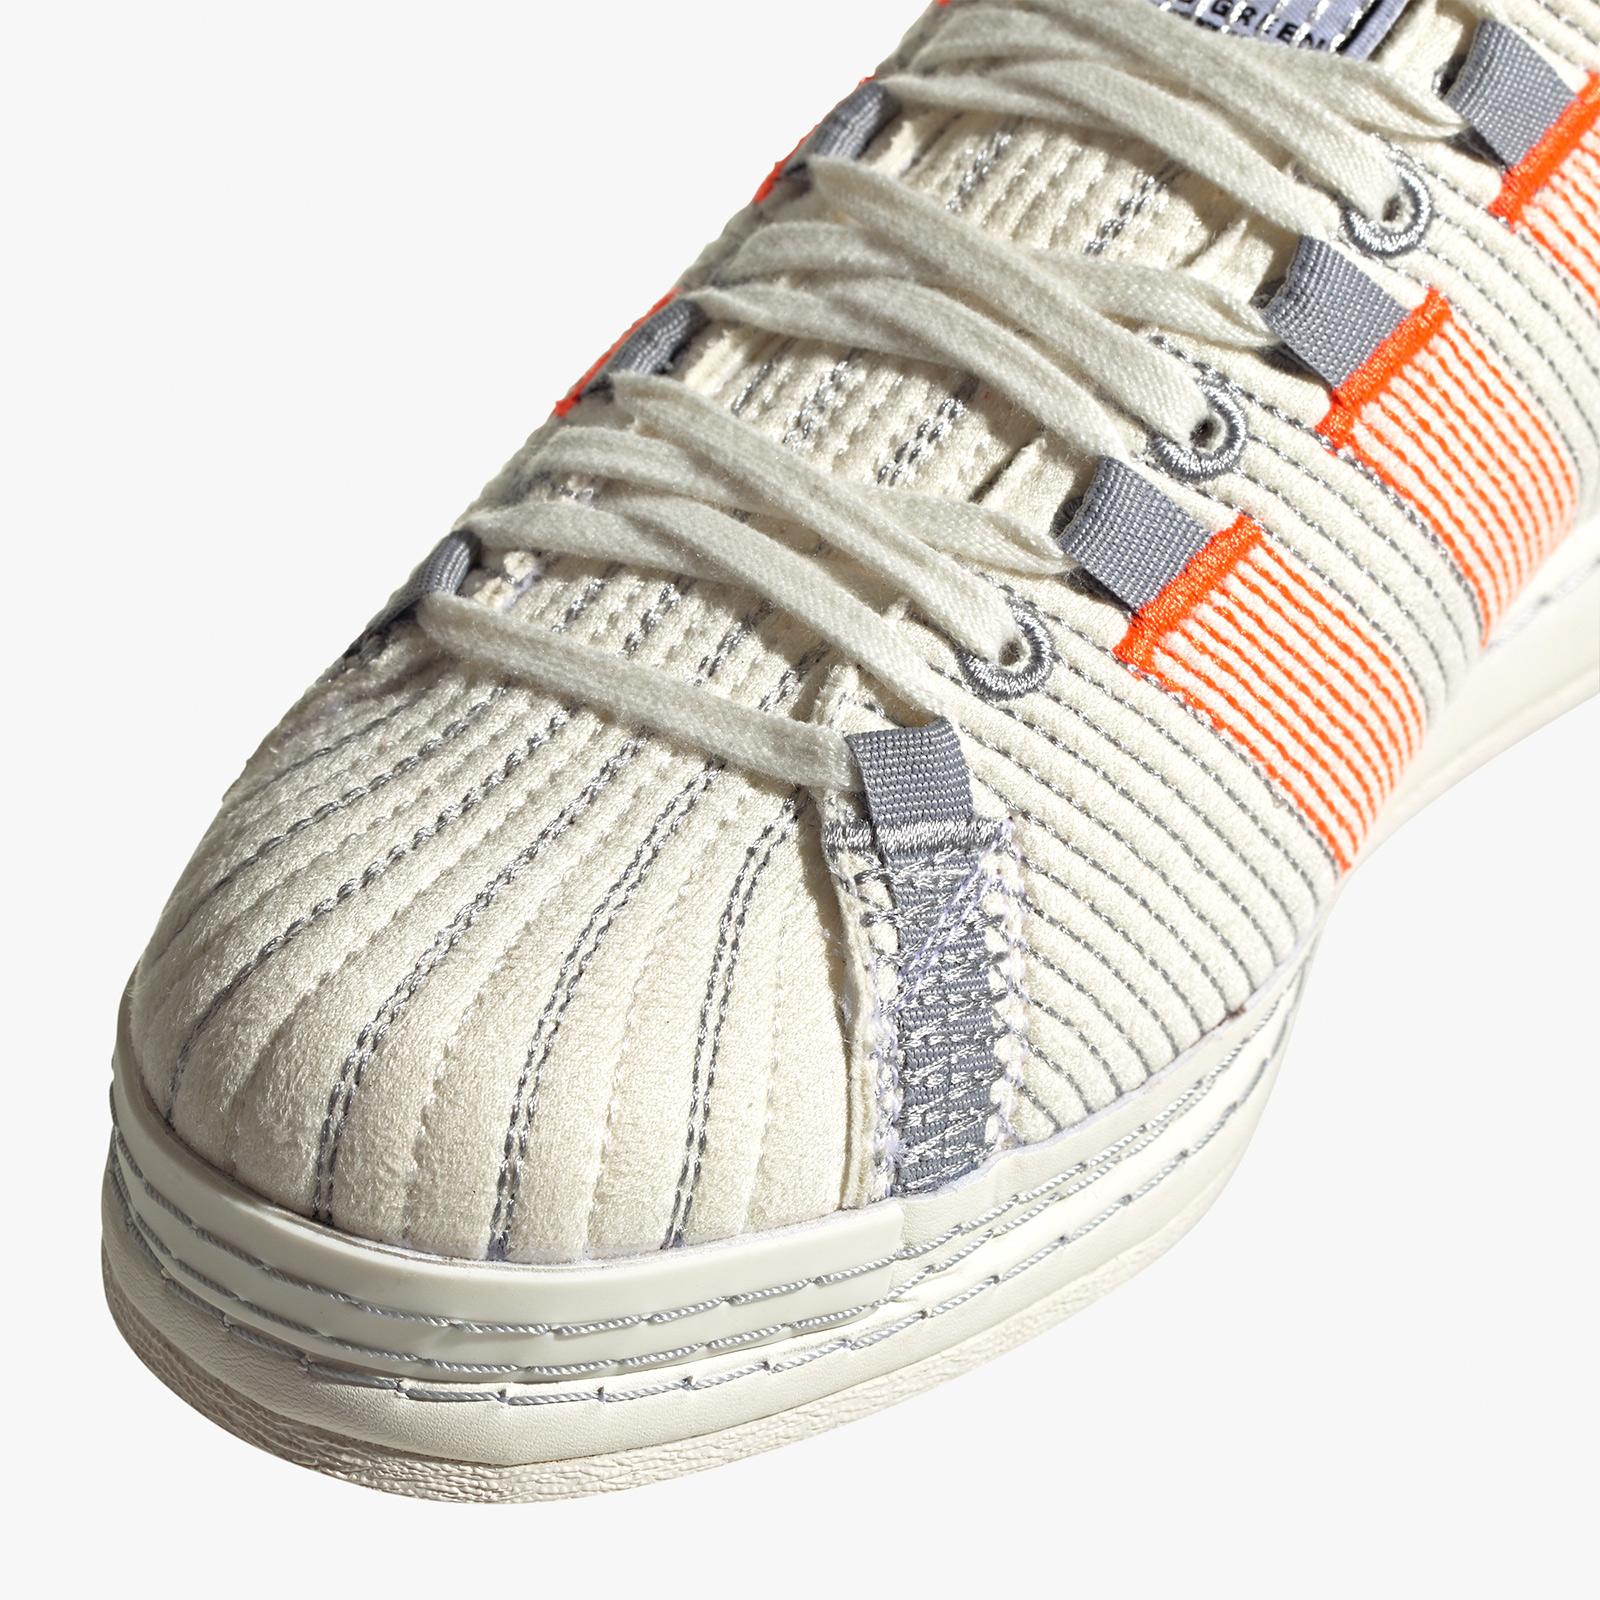 adidas Superstar x Craig Green - Fy5711 - SNS I Sneakers ...